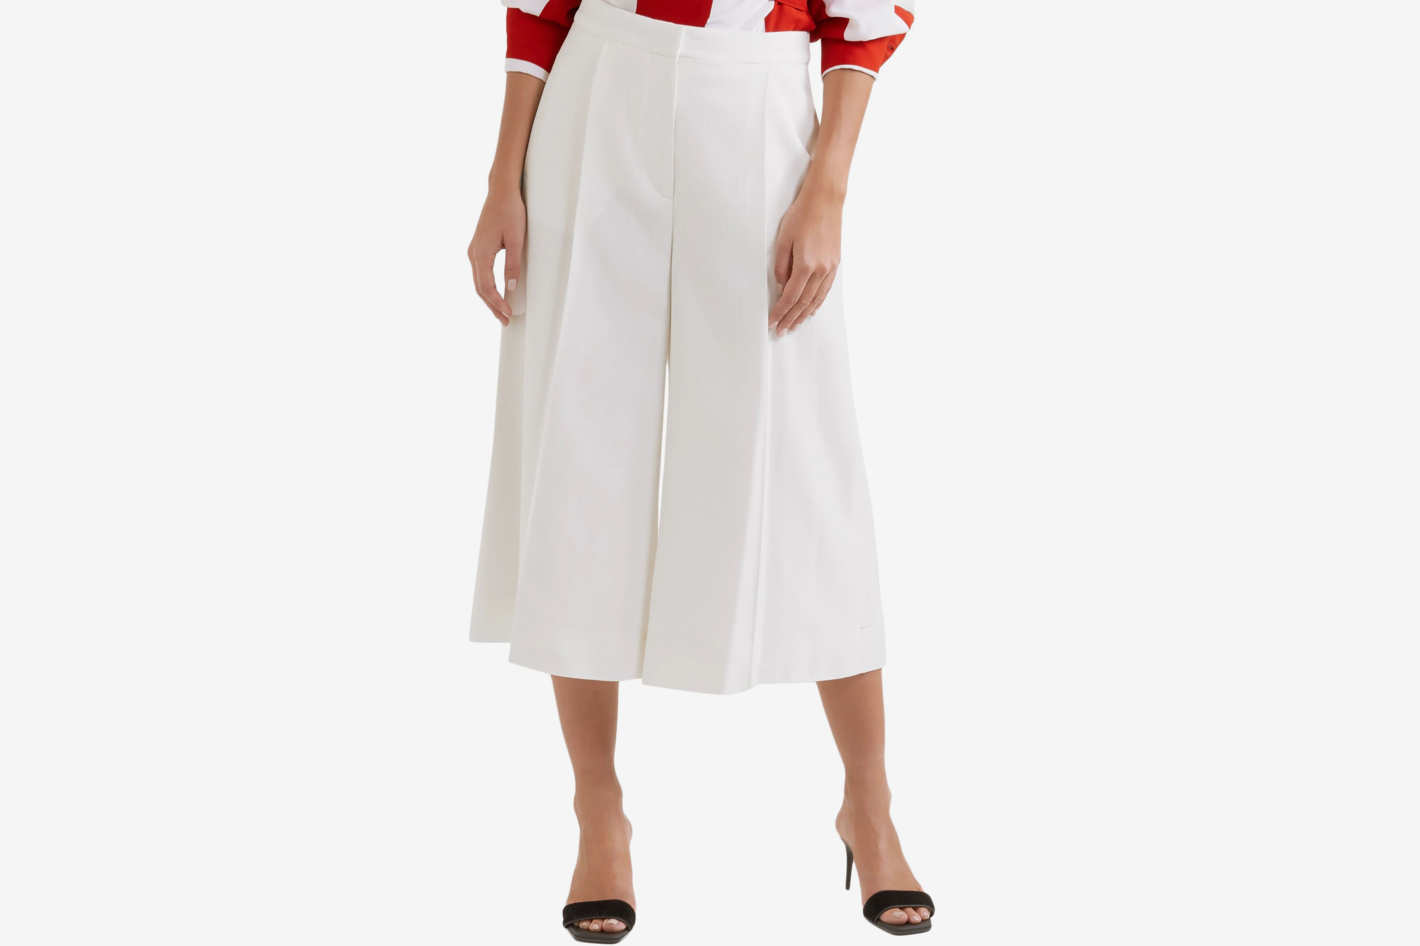 Stella McCartney Olivier Woven Culottes